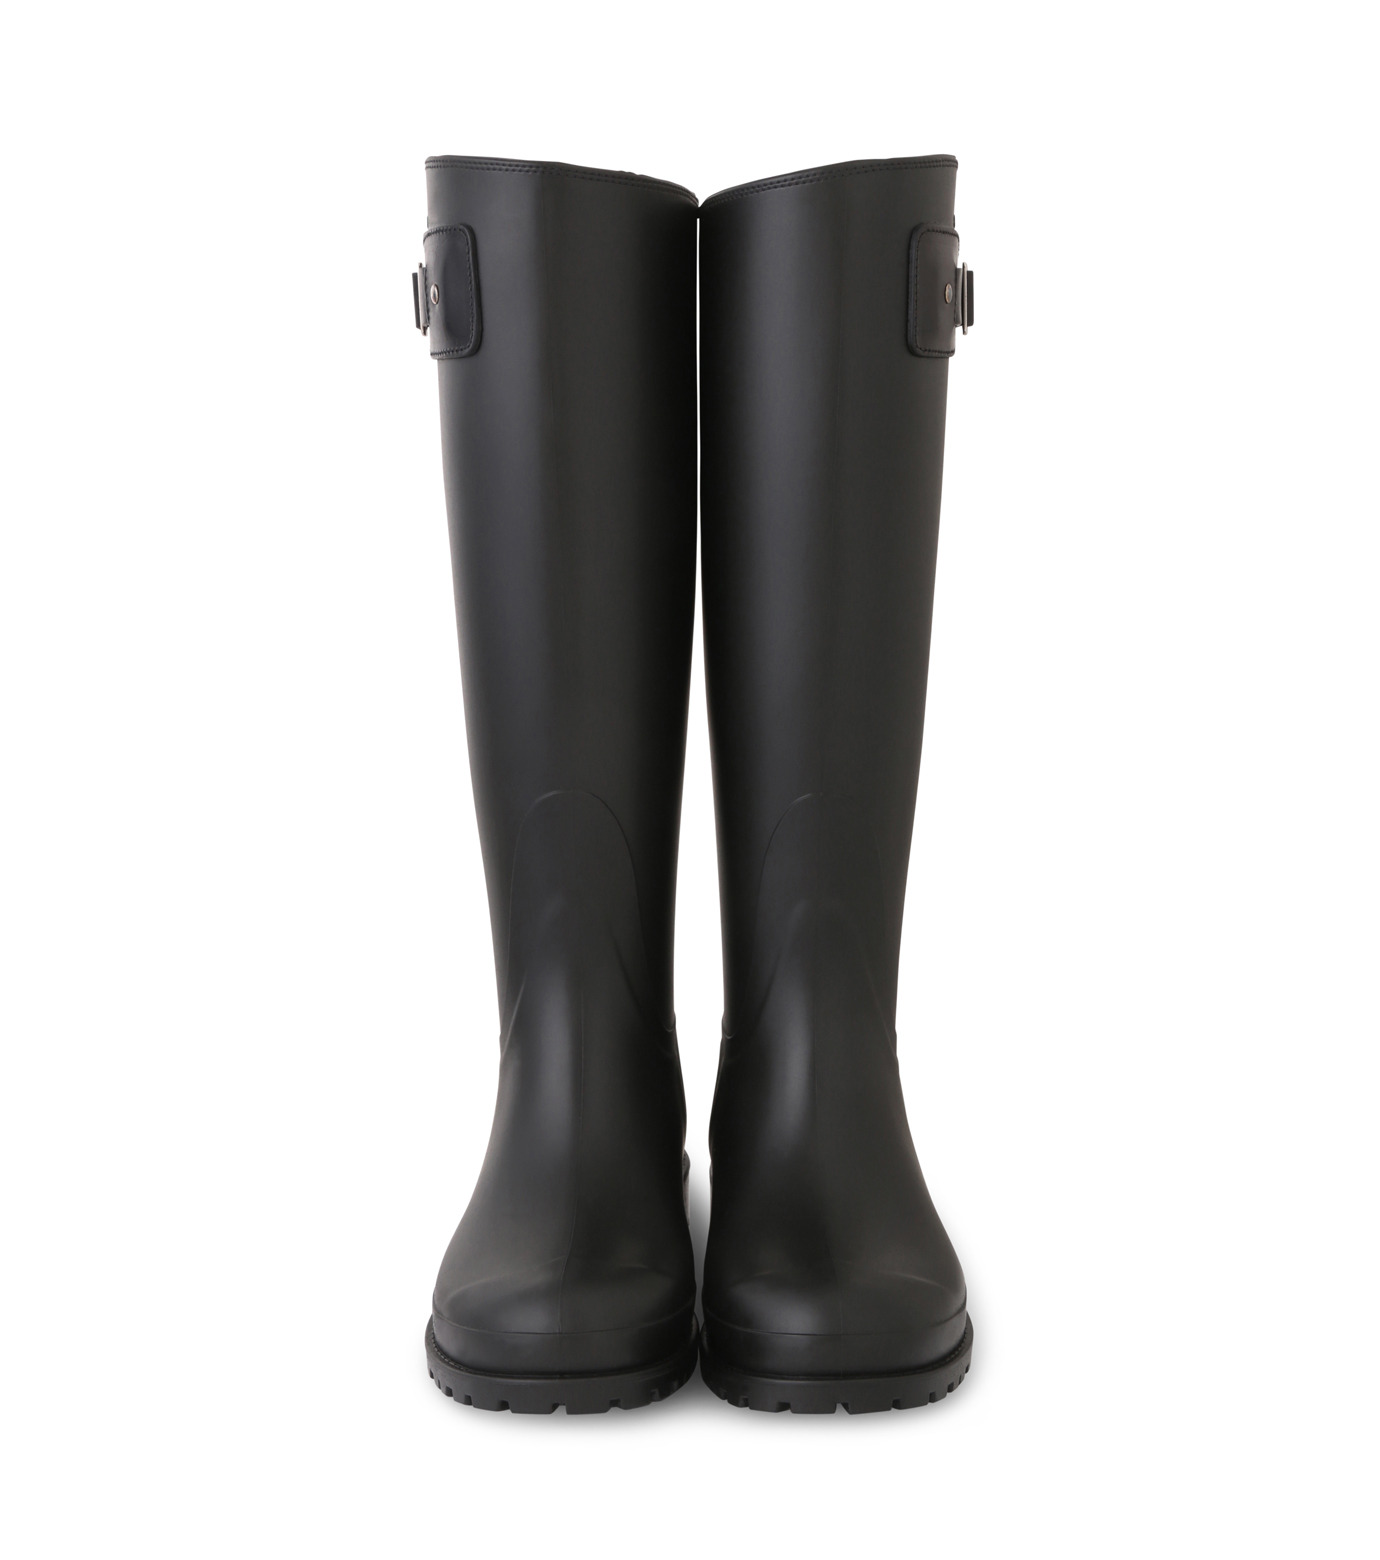 SAINT LAURENT(サンローラン)のRain Boots-BLACK(シューズ/shoes)-427315-GQN10-13 拡大詳細画像4